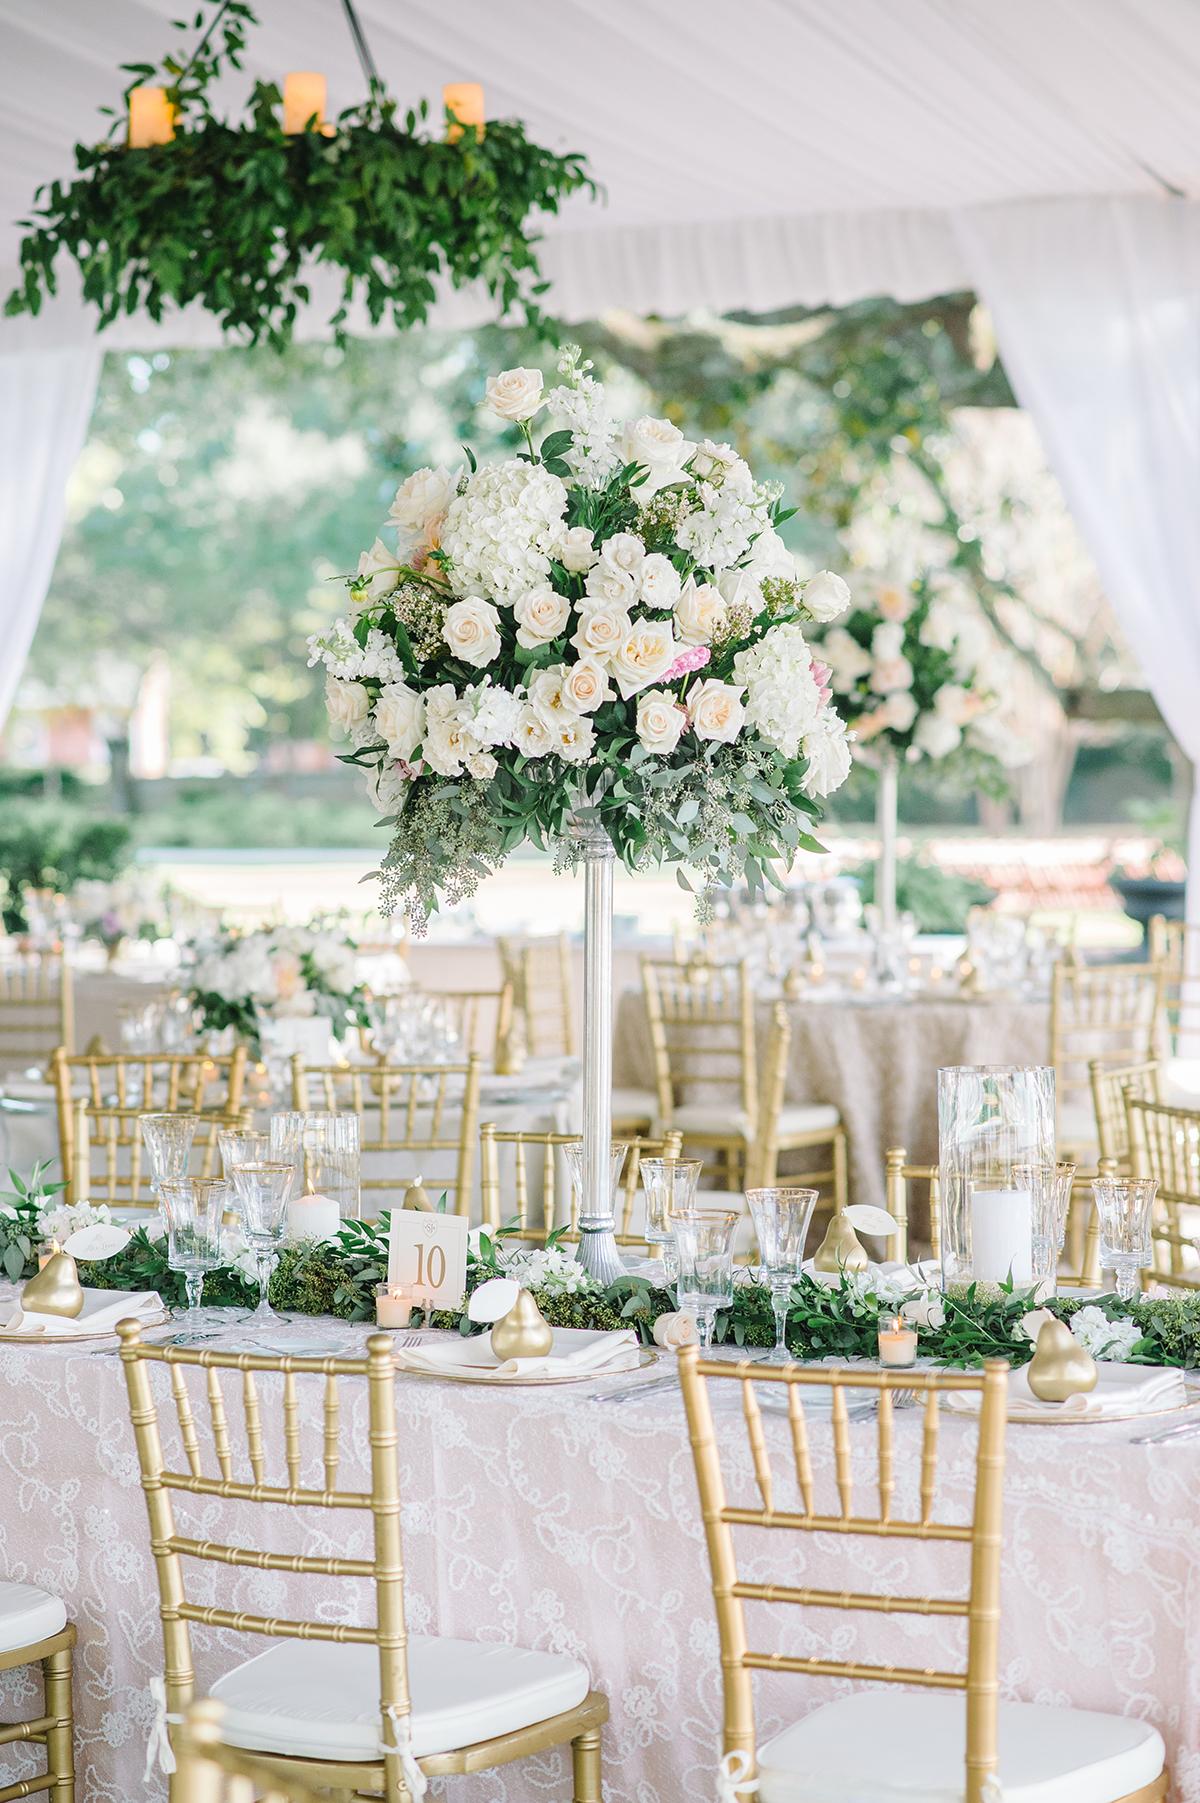 Elegant White Tented Wedding Reception Elizabeth Anne Designs The